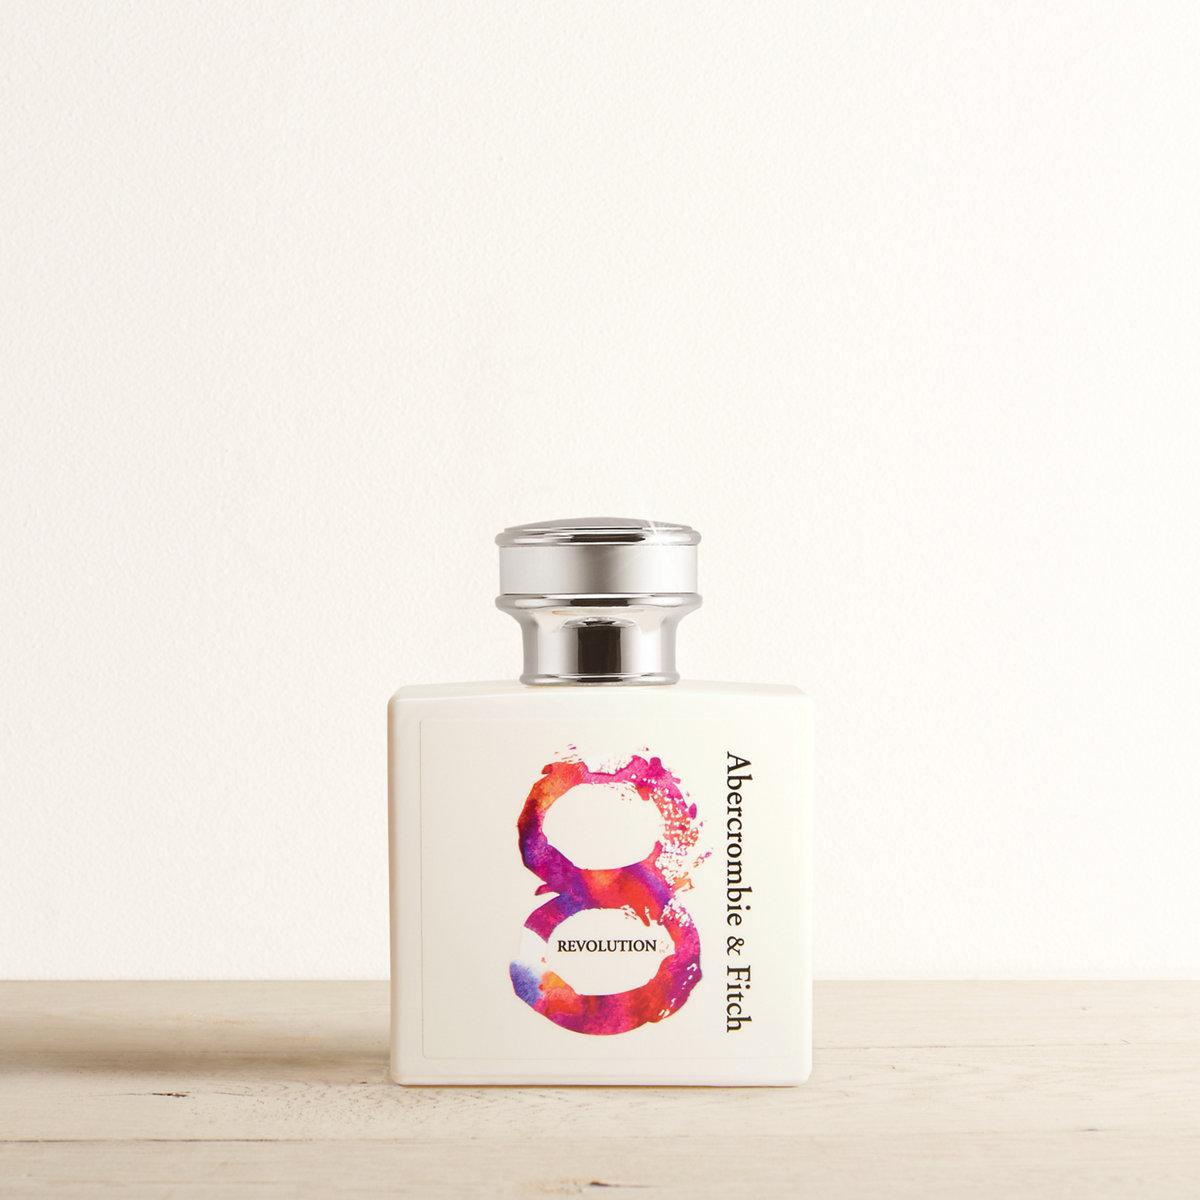 9 Revolution Perfume